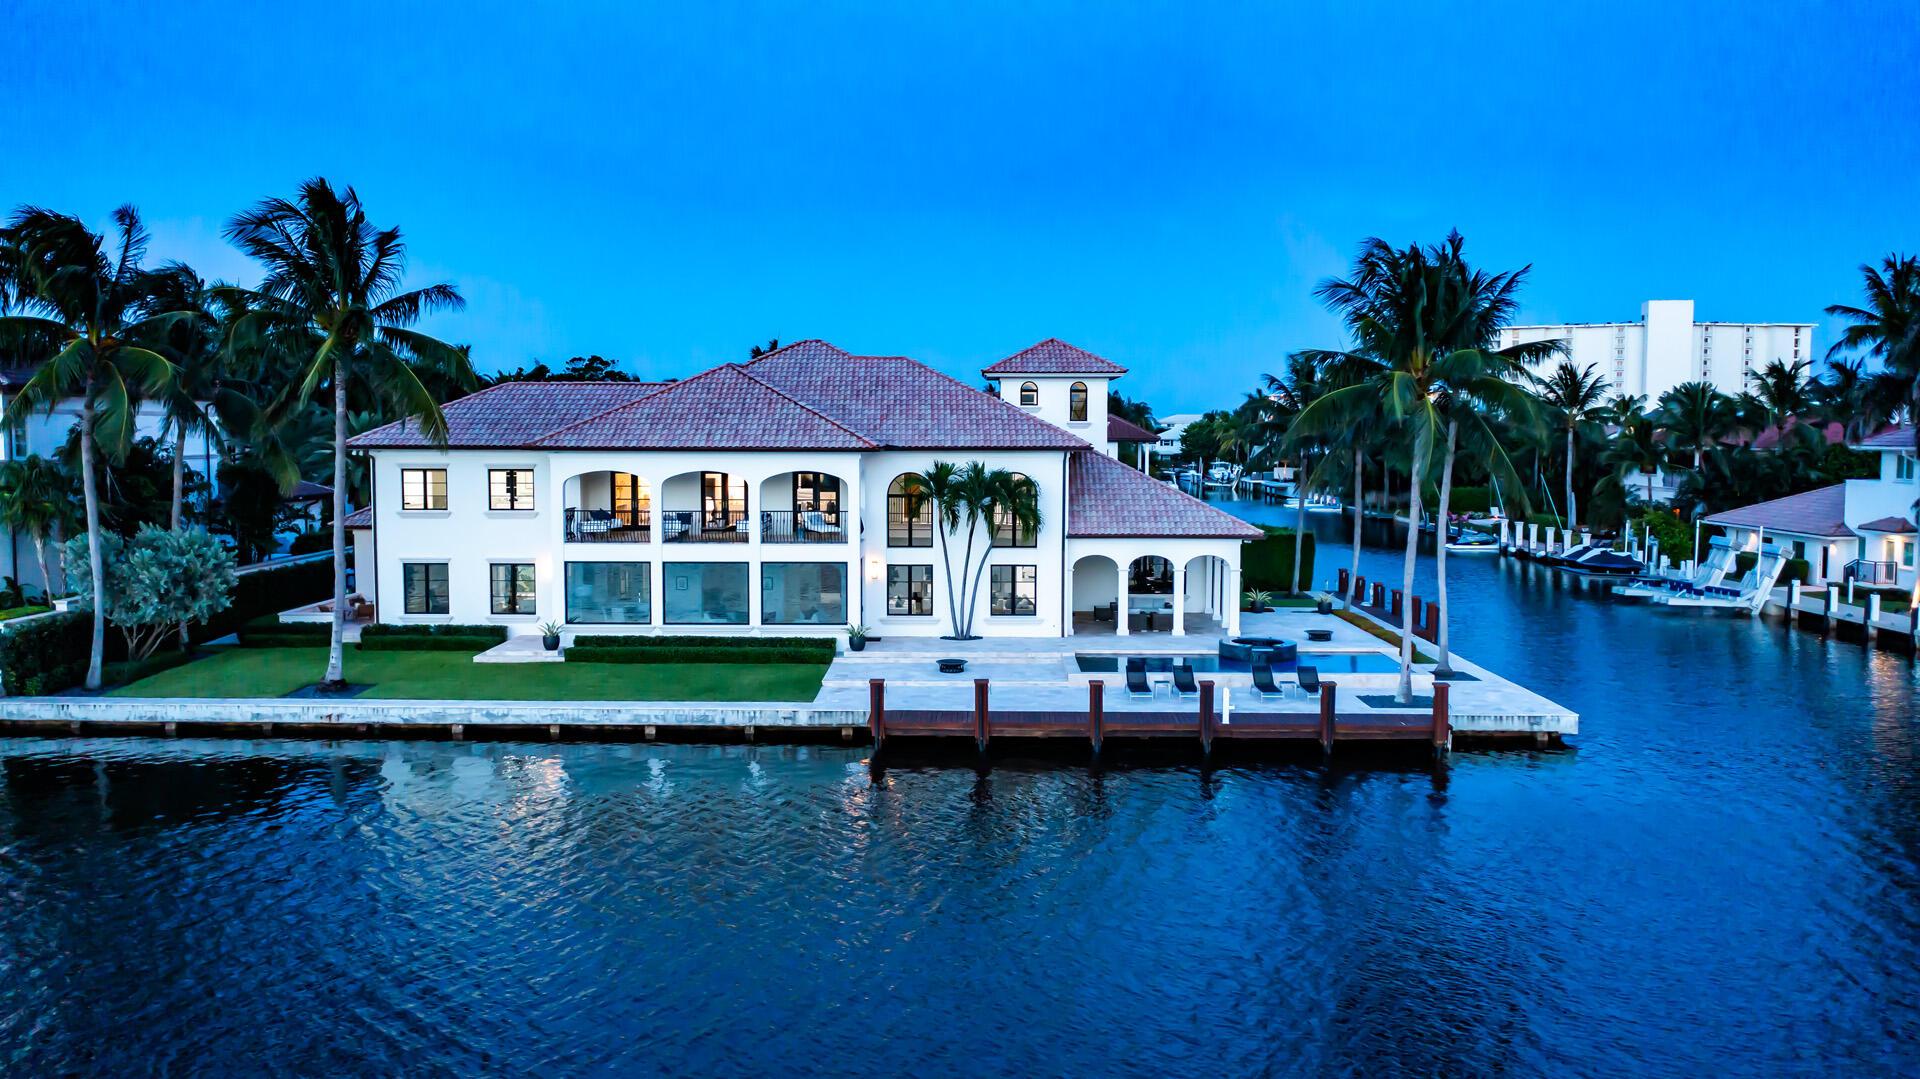 1002 Lewis Cove Road, Delray Beach, FL 33483